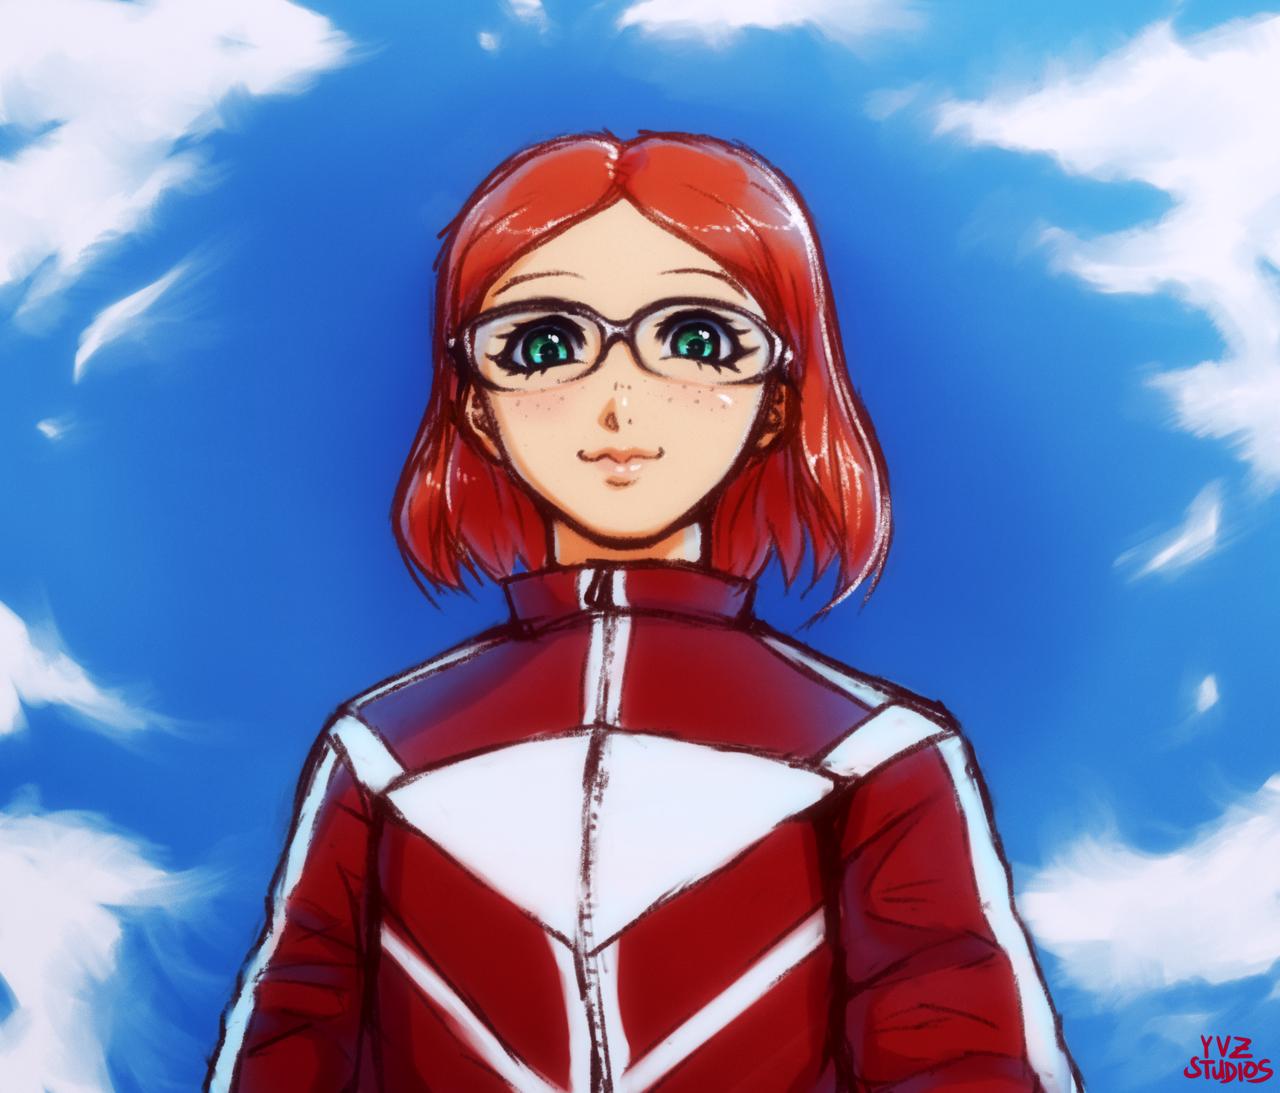 Kid A - Anime Girl by Gubnub